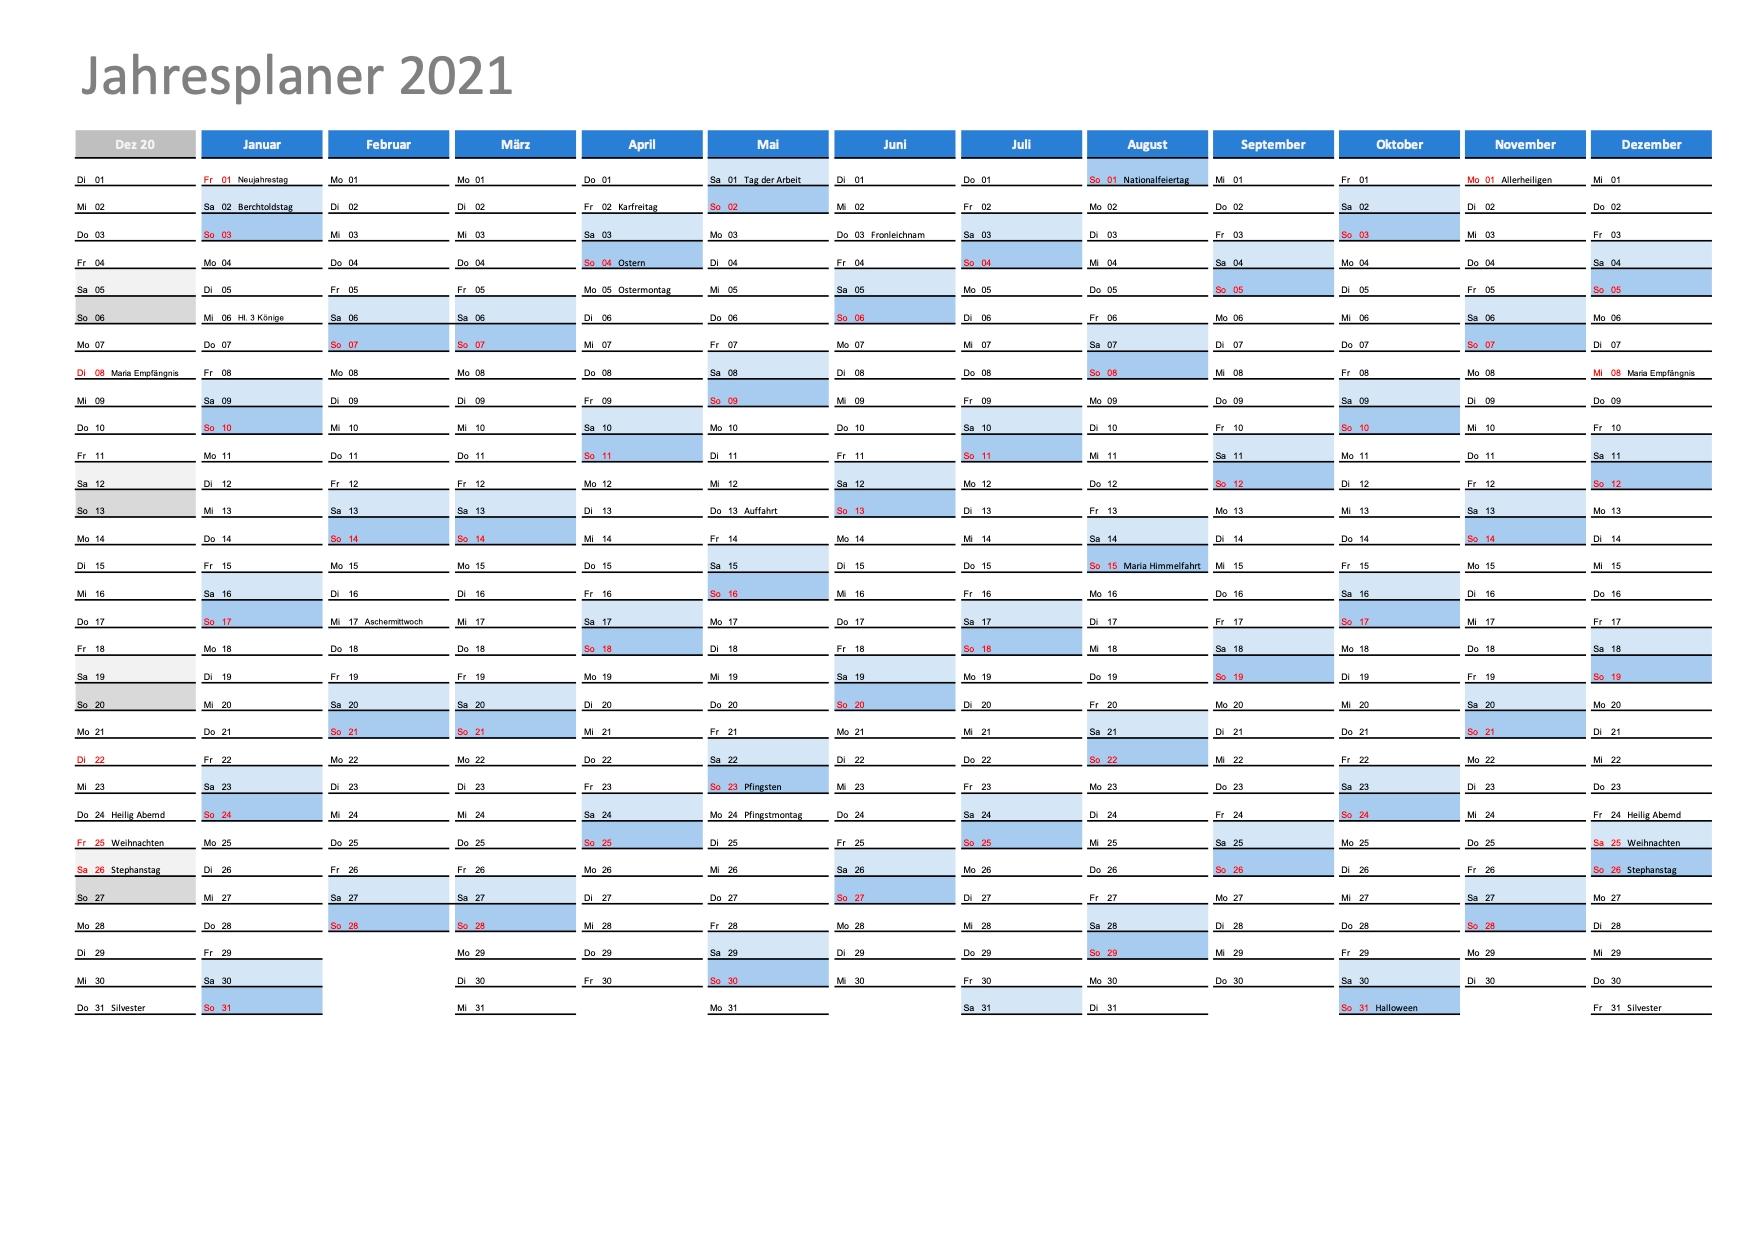 Take Kalenderpedia 2021 Schweiz Pro Monat